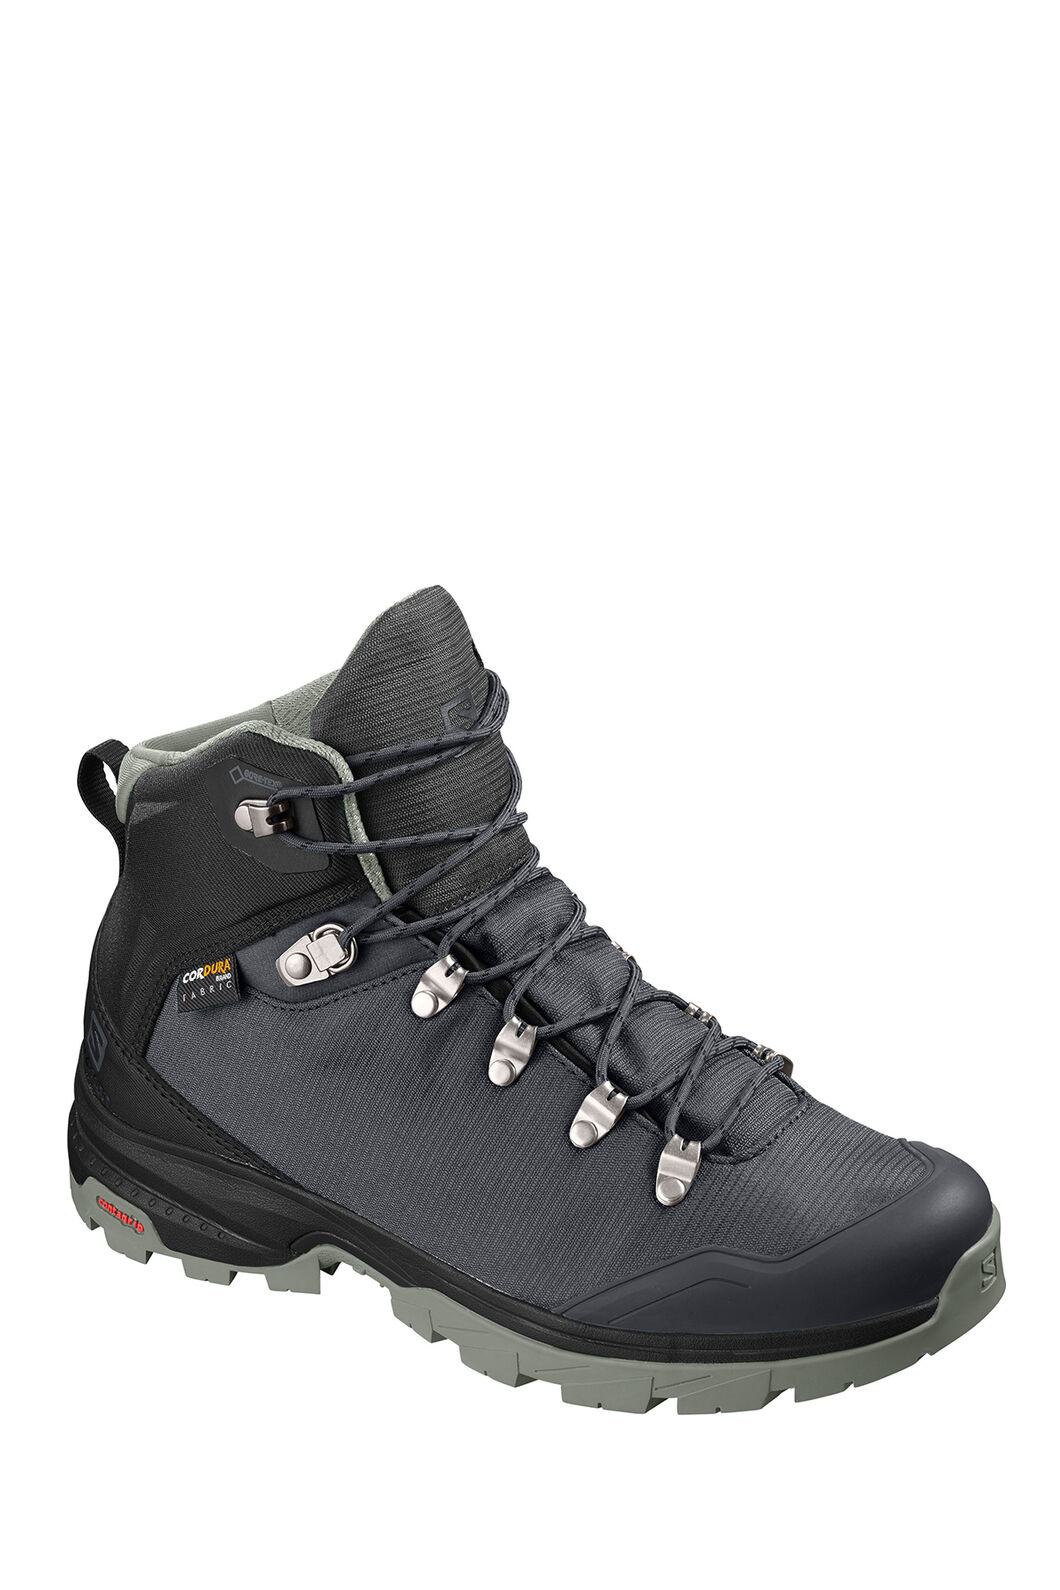 Salomon Outback 500 GTX WP Hiking Boots — Women's, Ebony/Black/Shadow, hi-res